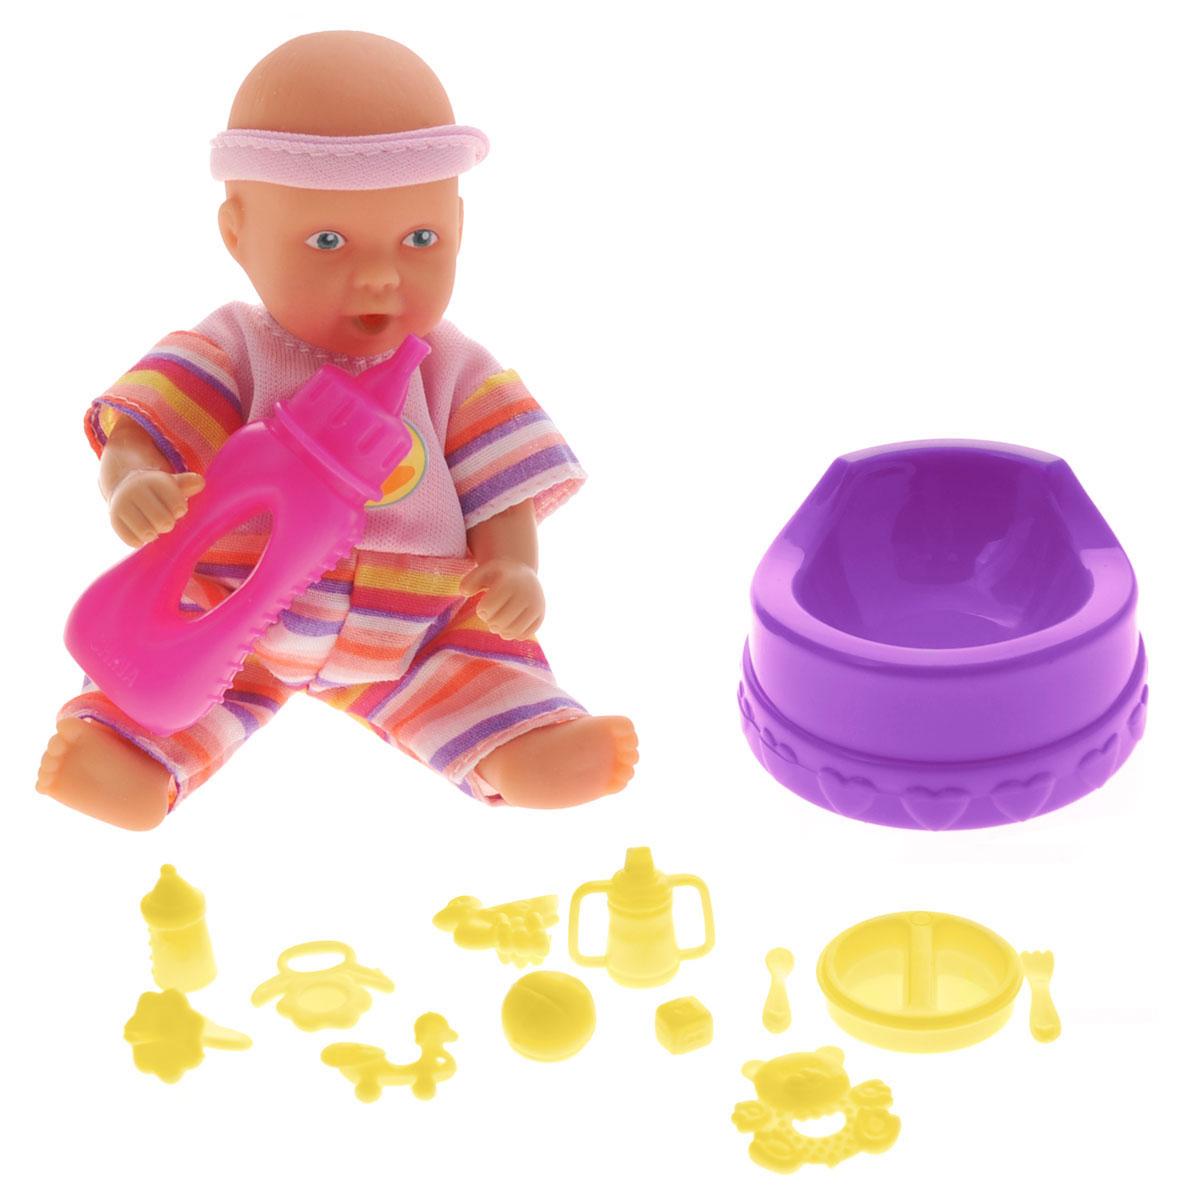 Simba Пупс Mini New Born Baby цвет бутылочки розовый simba паровоз инерционный цвет желтый